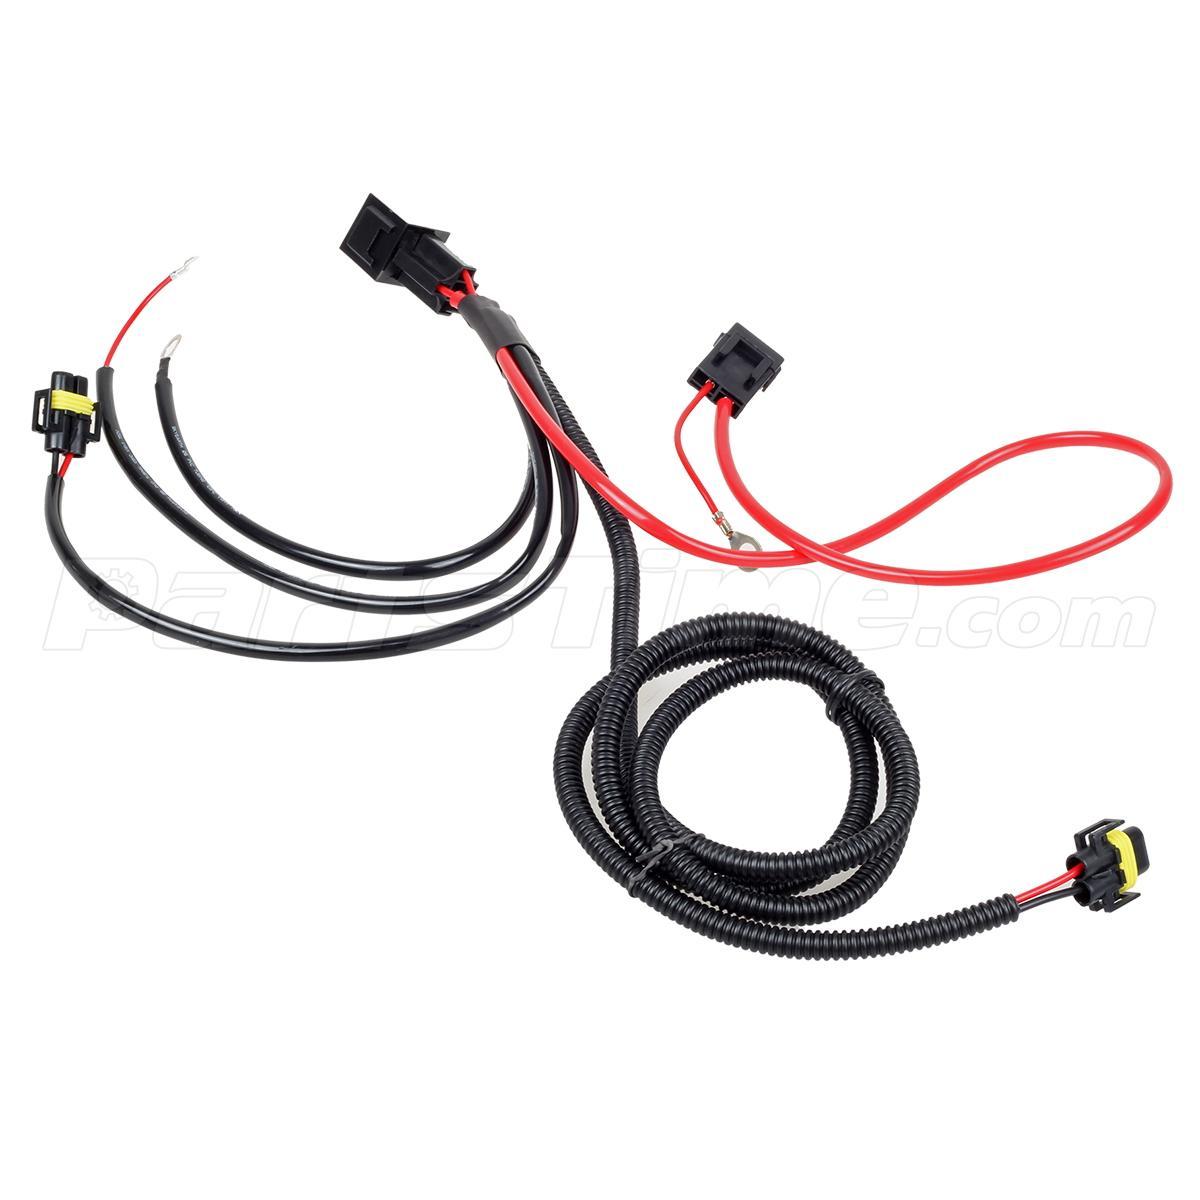 hight resolution of h11 880 881 headlight fog light drl relay wiring harness